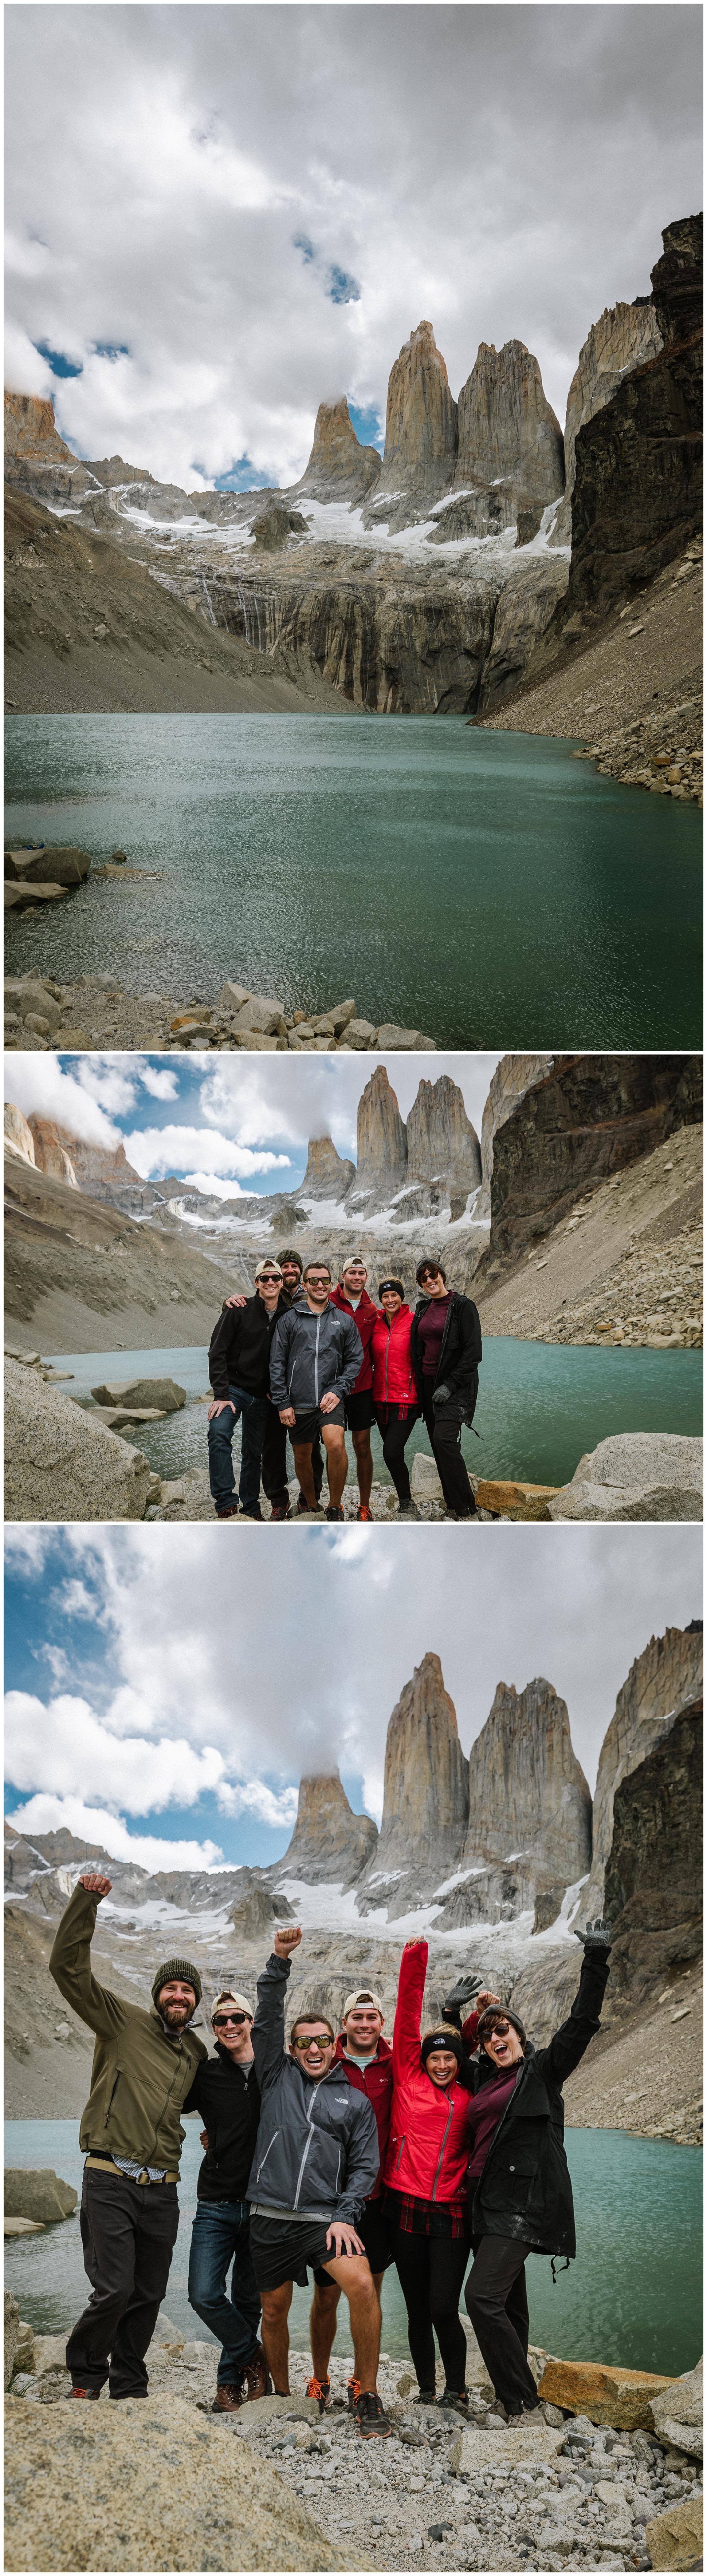 Cheilean-destination-adventure-wedding-florida-patagonia-pucon-santa-cruz-vsco_0008.jpg